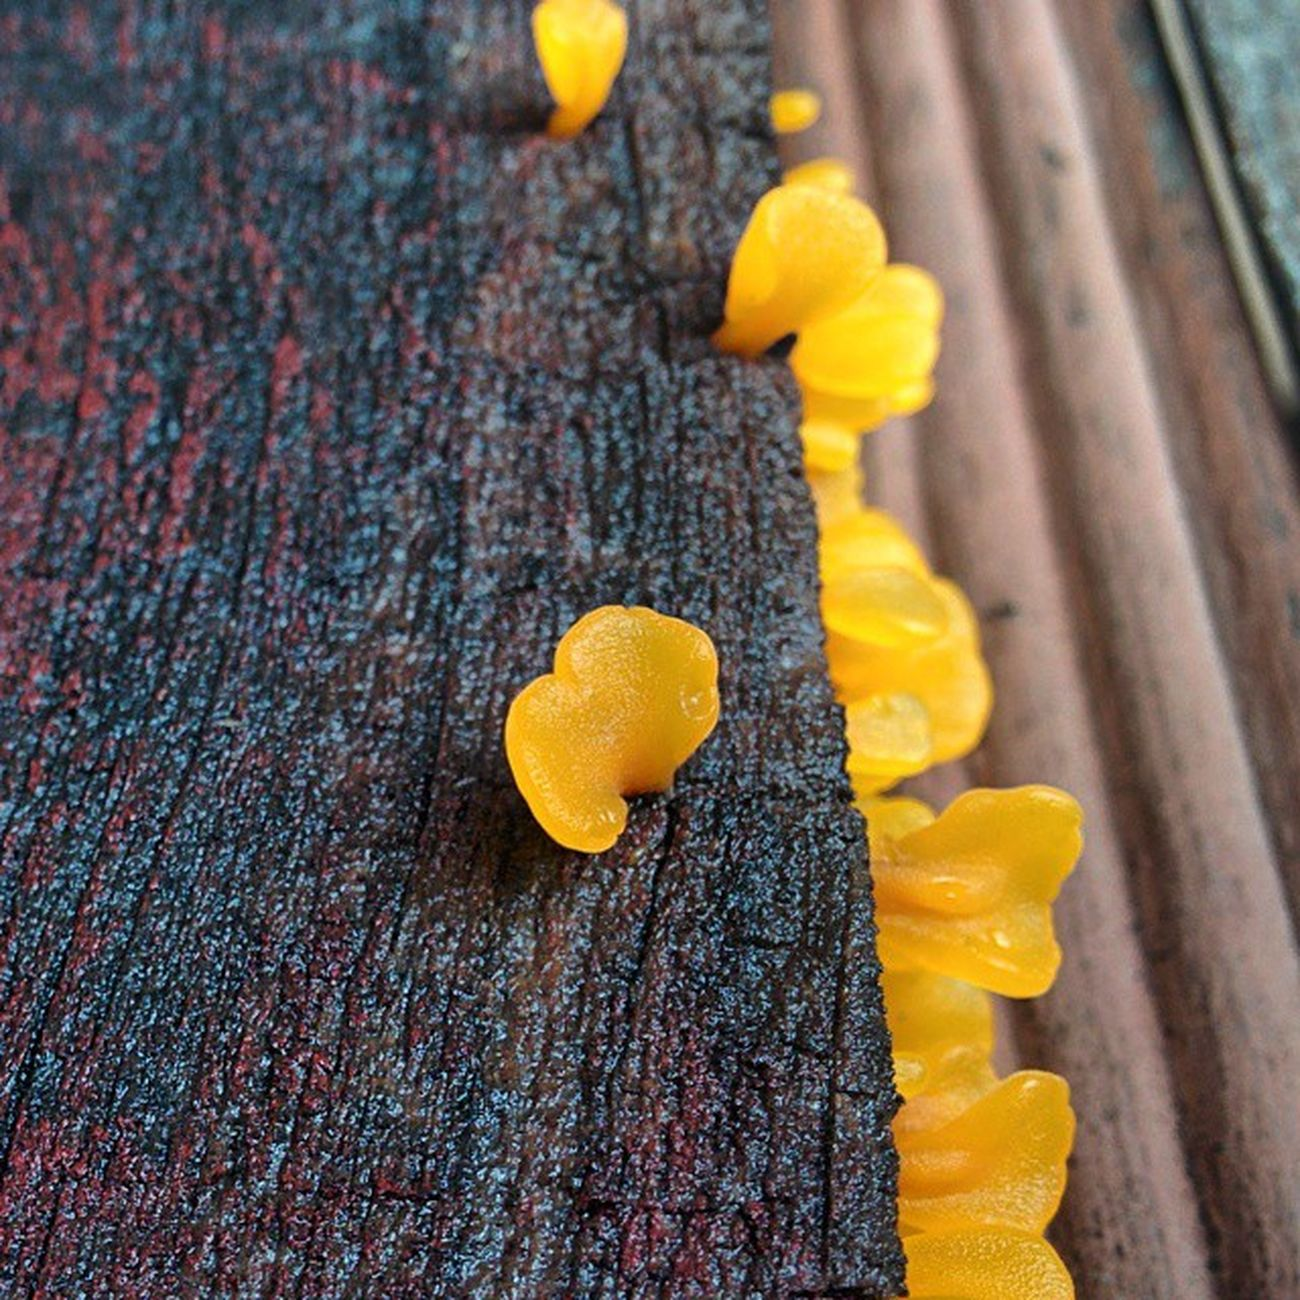 Ok i am Obsessed Dontknowwhy Fungi Fungus Yellow Wood Woodgrain Closeup Nexus5 Hdrplus Nofilter Notsurewhatitis